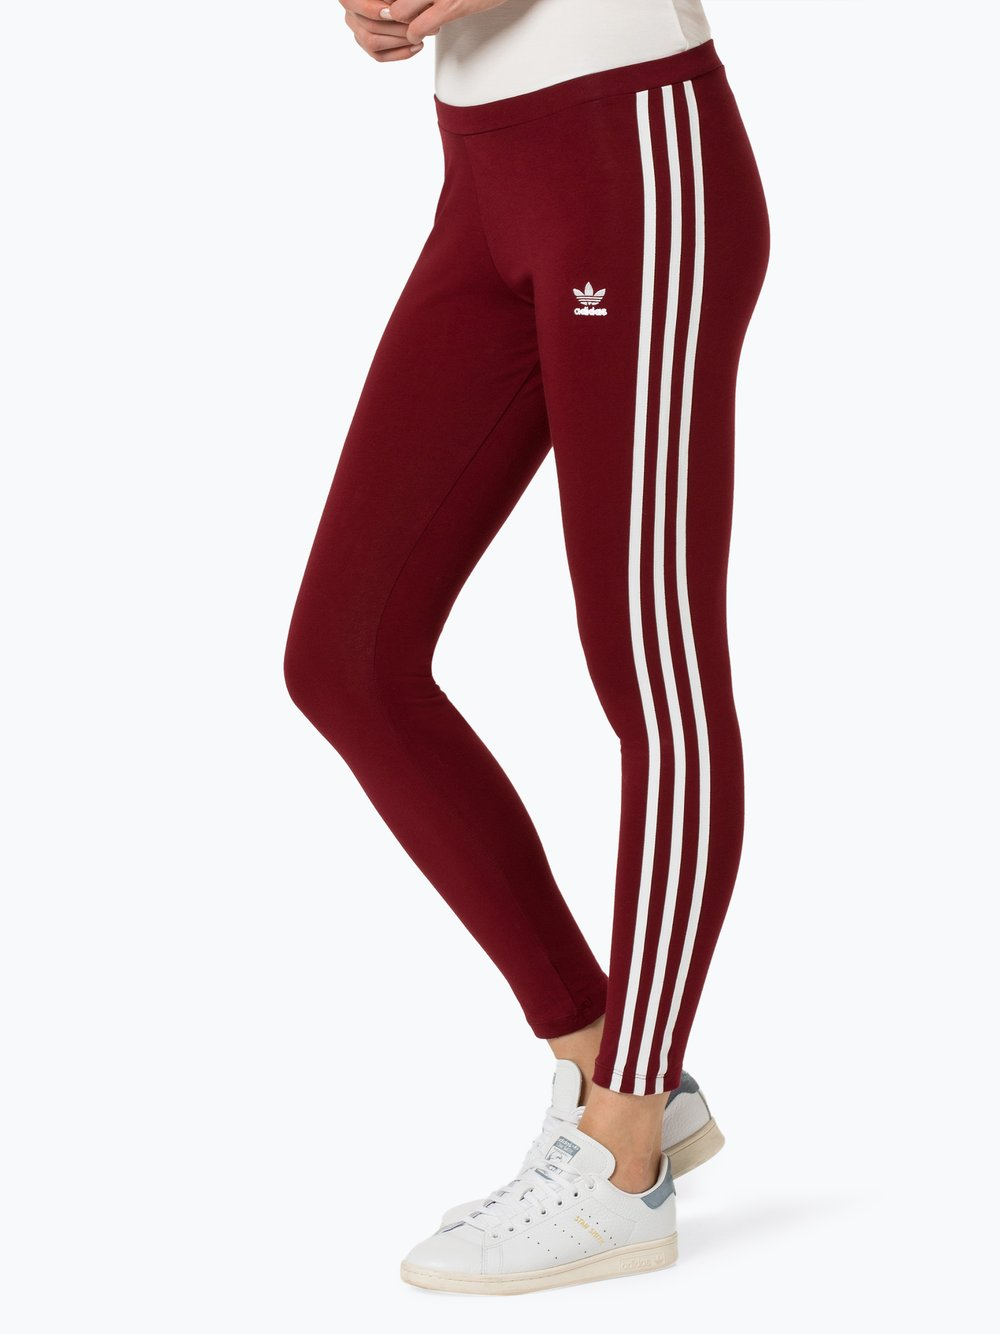 348f9795e2df75 adidas Originals Sportowe legginsy damskie kup online | VANGRAAF.COM